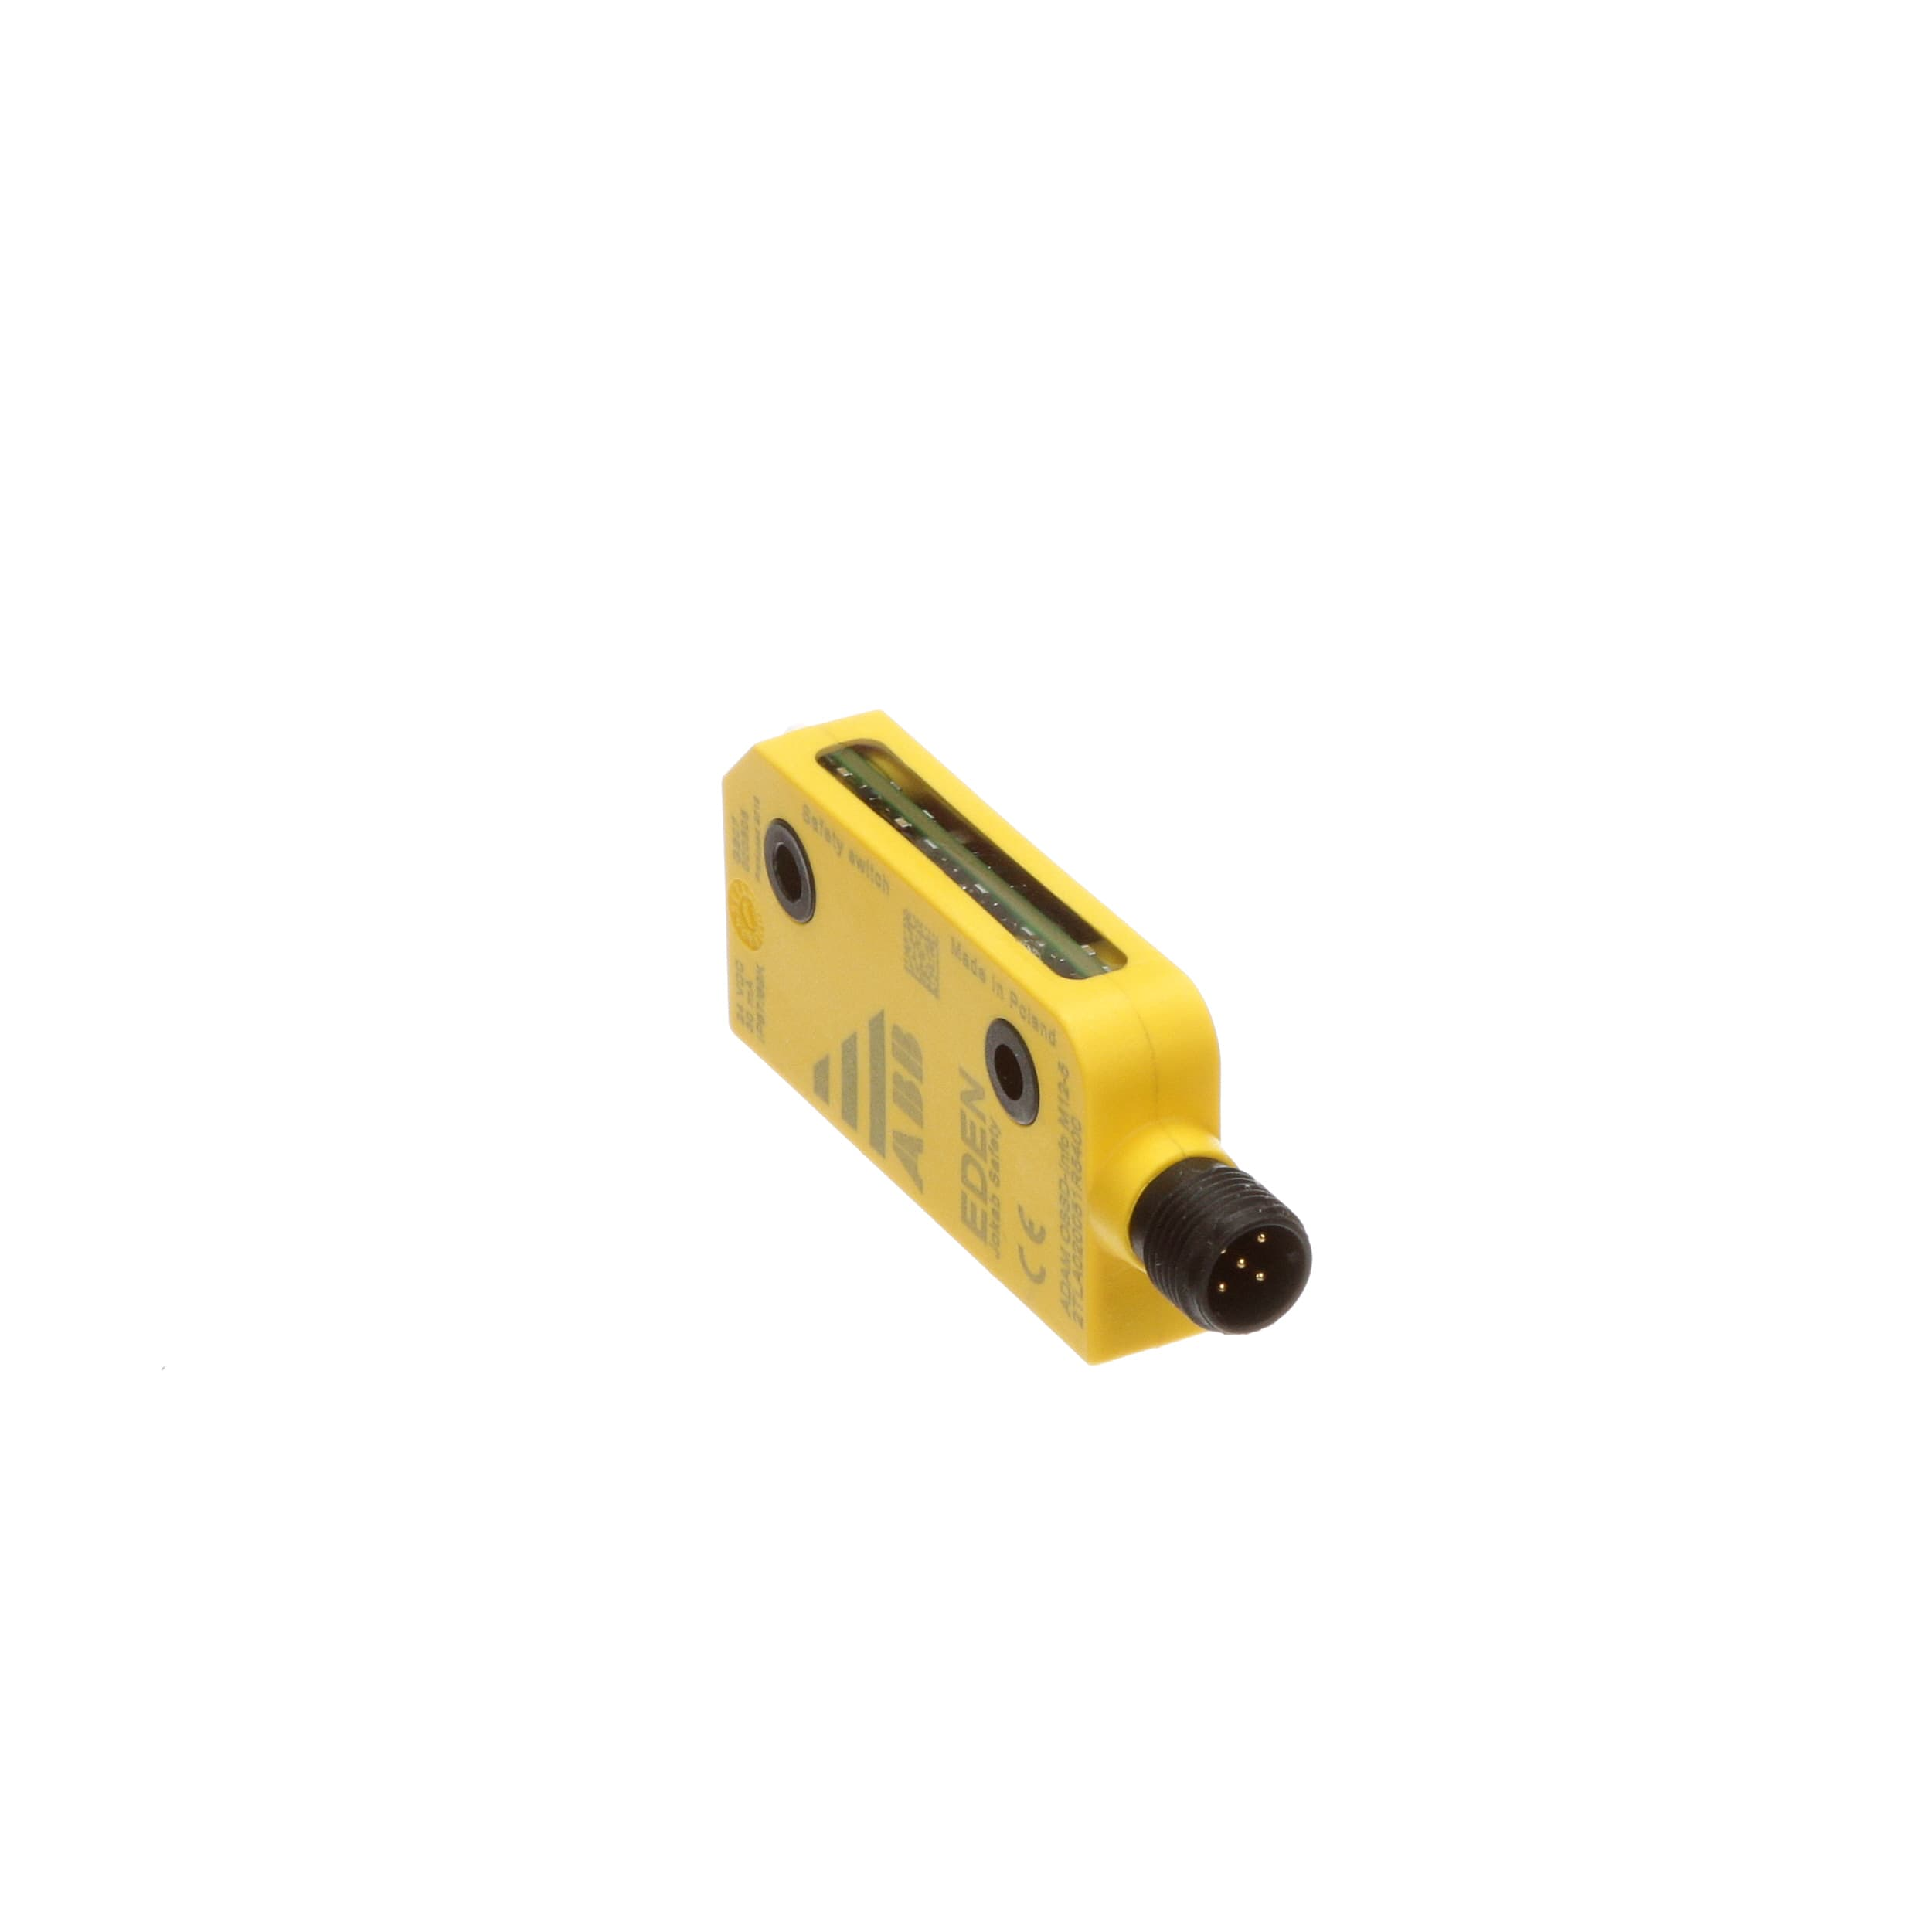 M12 Sensor Straight 5 Position Receptacle AR0500102 SL400 Sensor Cable Free End 49.2 ft AR0500102 SL400 15 m